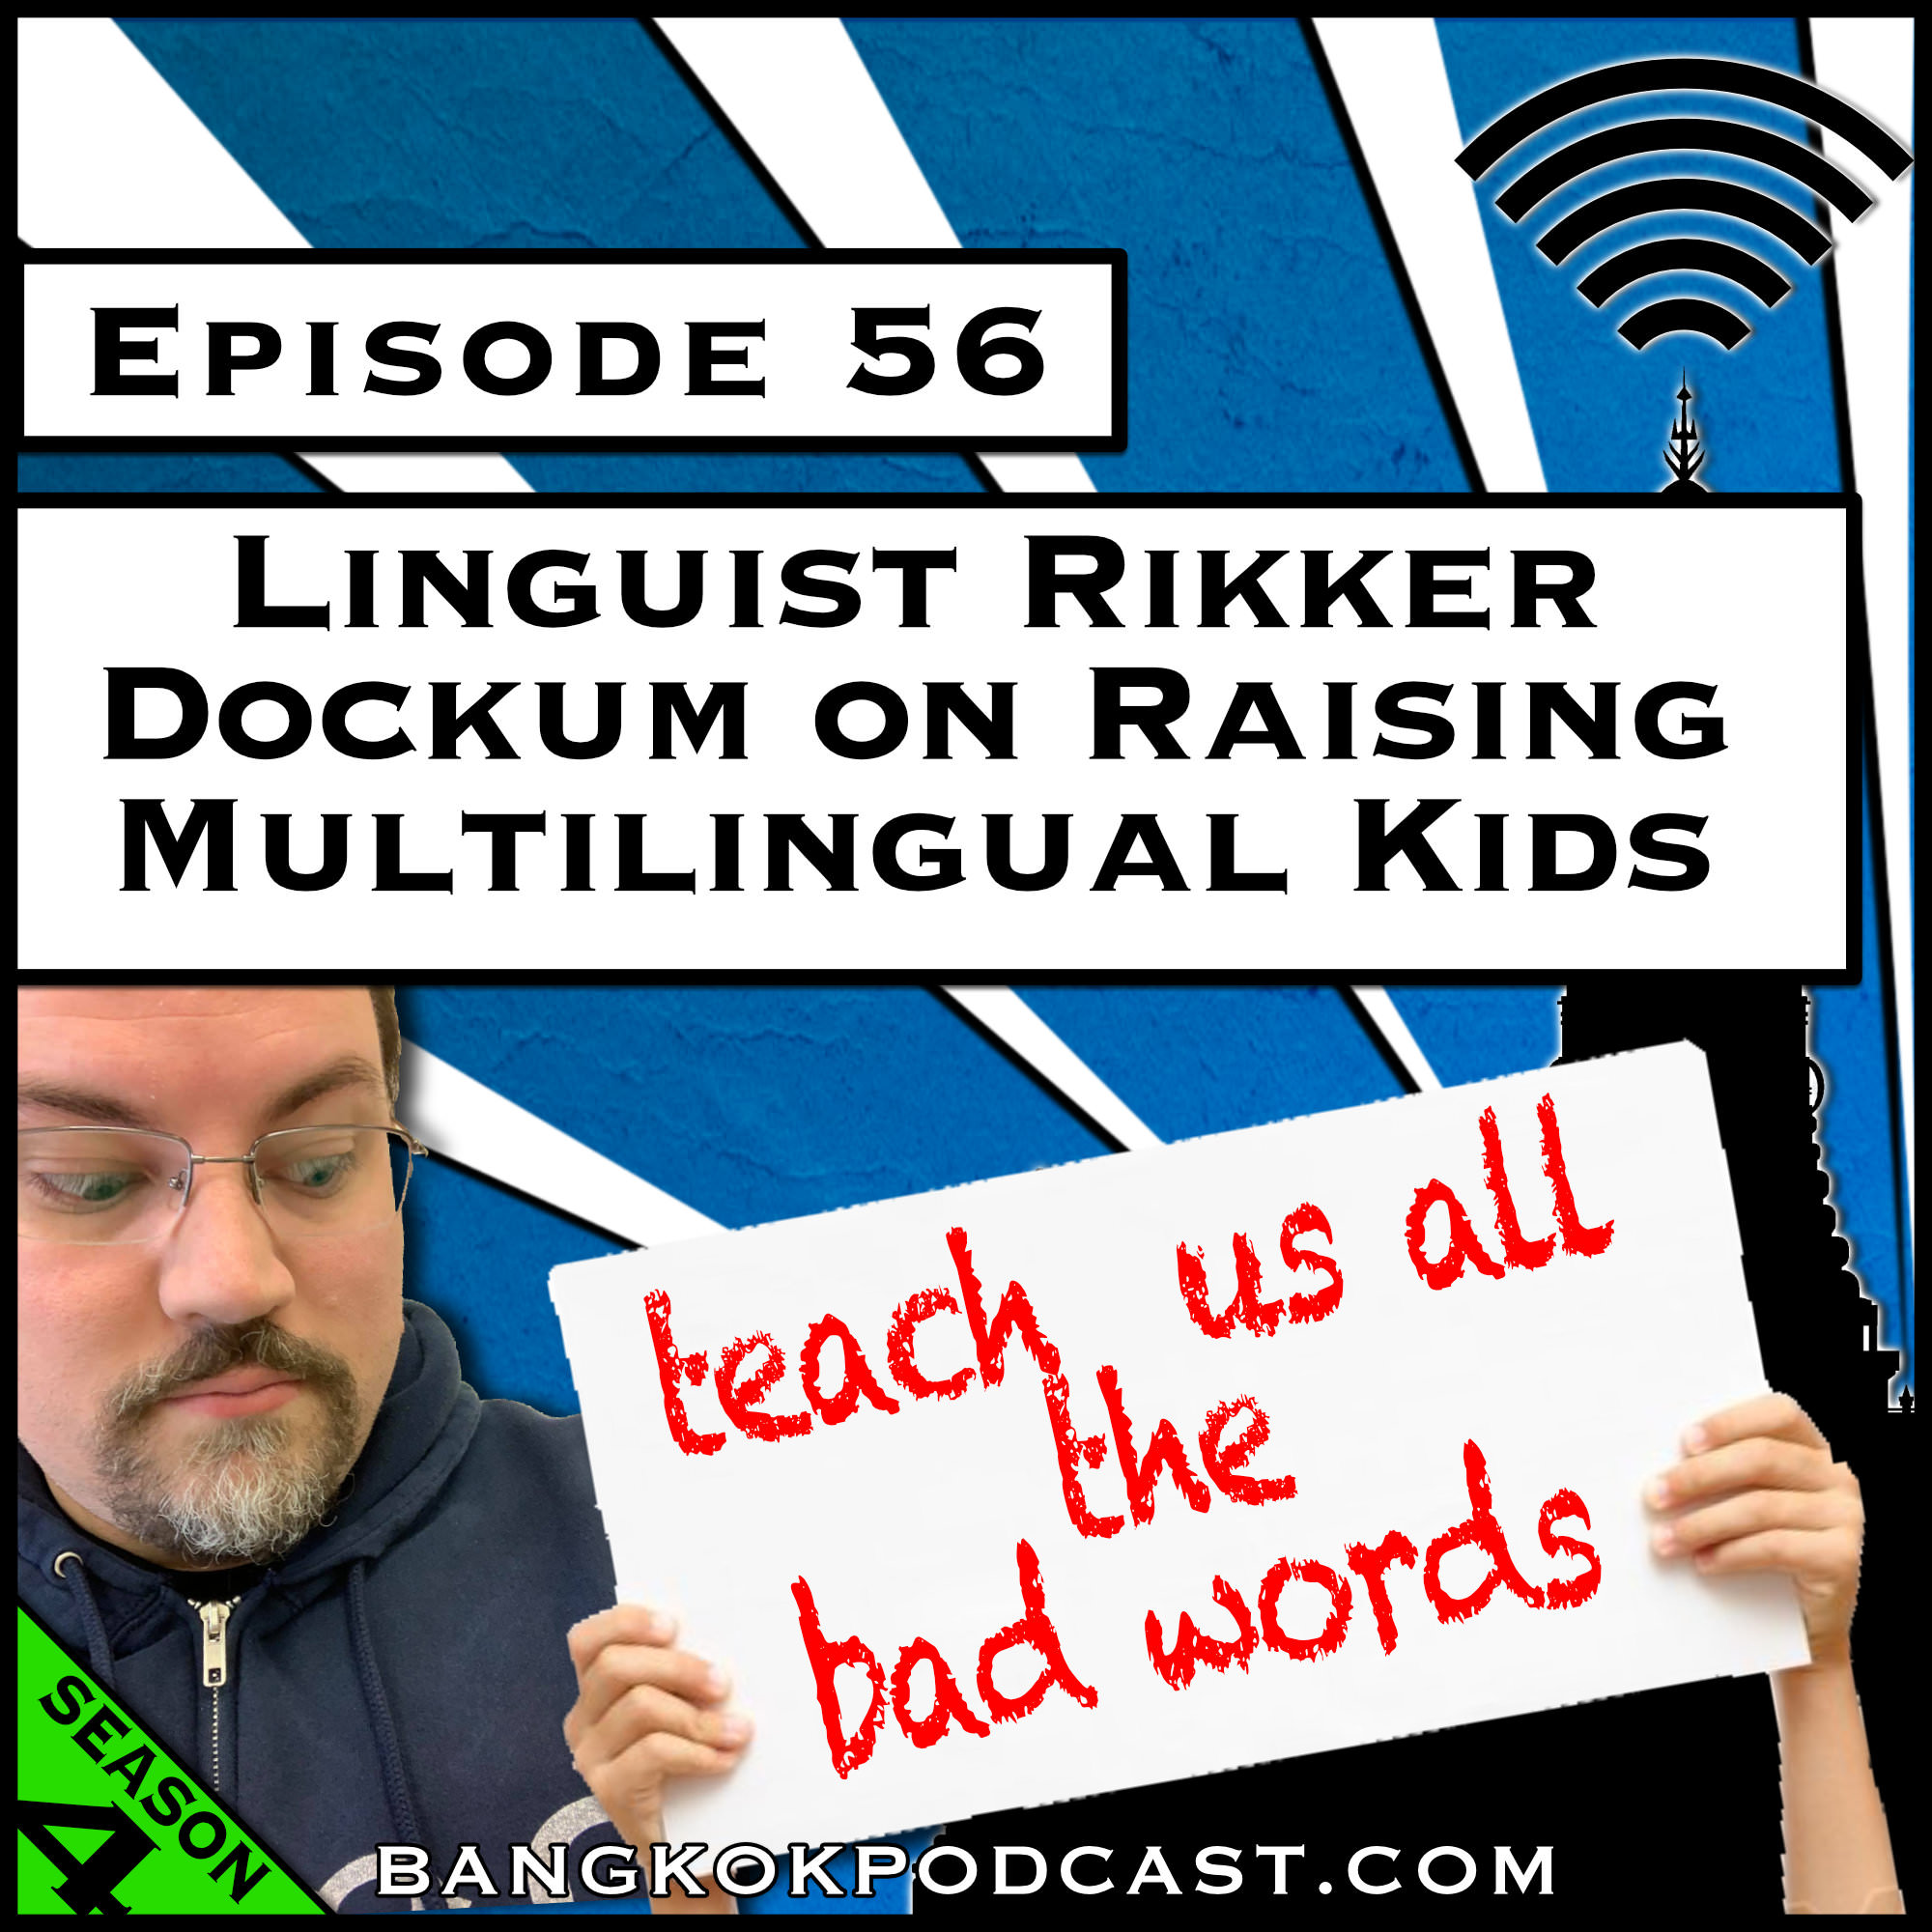 Linguist Rikker Dockum on Raising Multilingual Kids